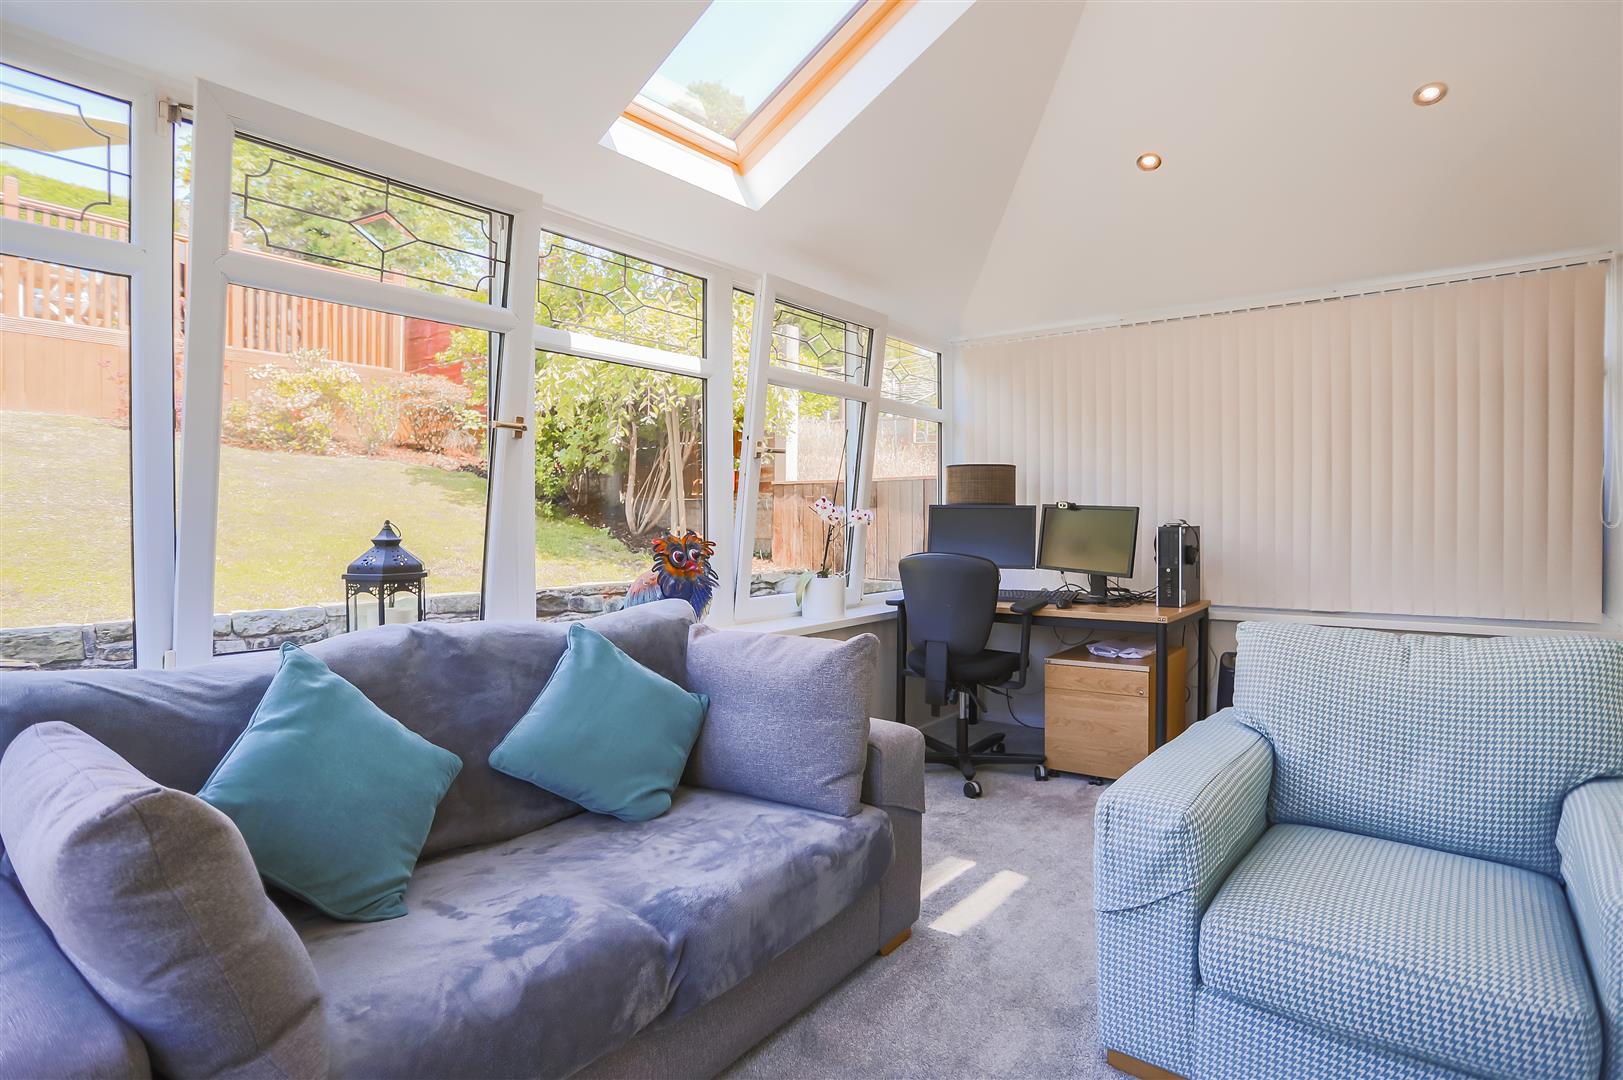 4 Bedroom Semi-detached House For Sale - Image 5